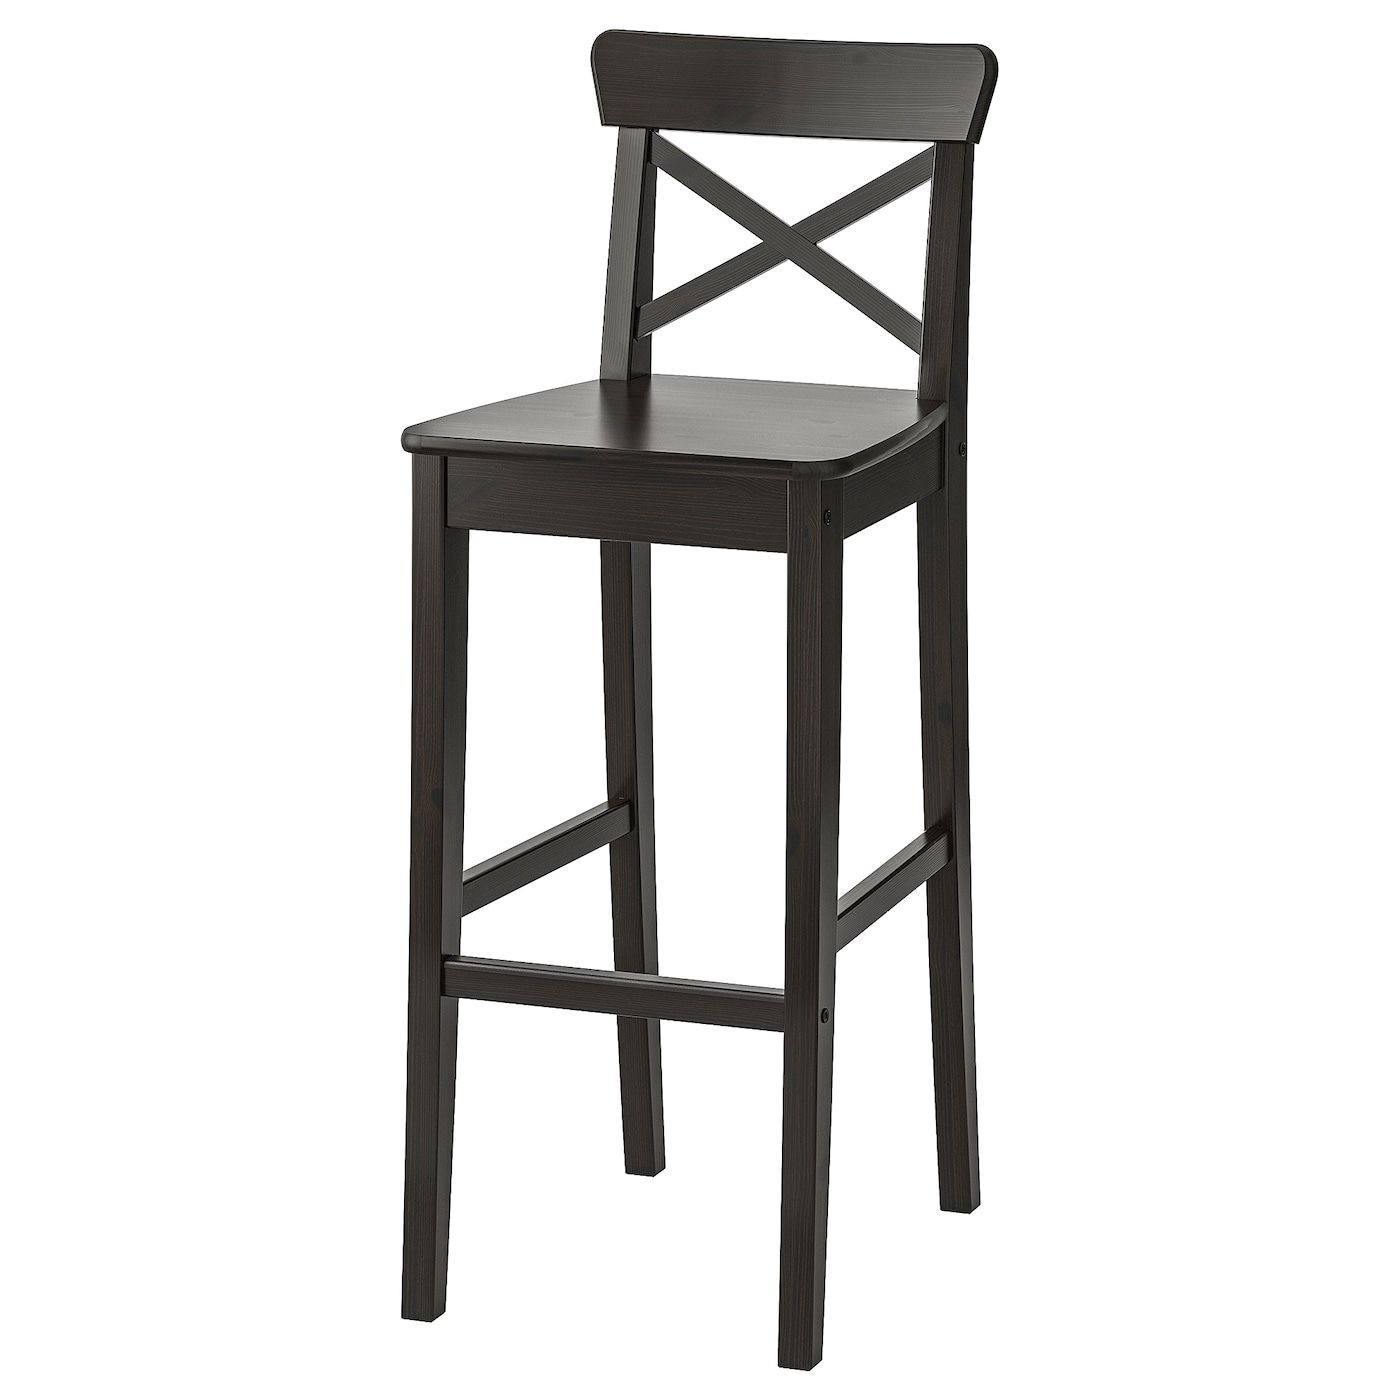 Nanook Bar Counter Chair Transitional Midcentury Modern